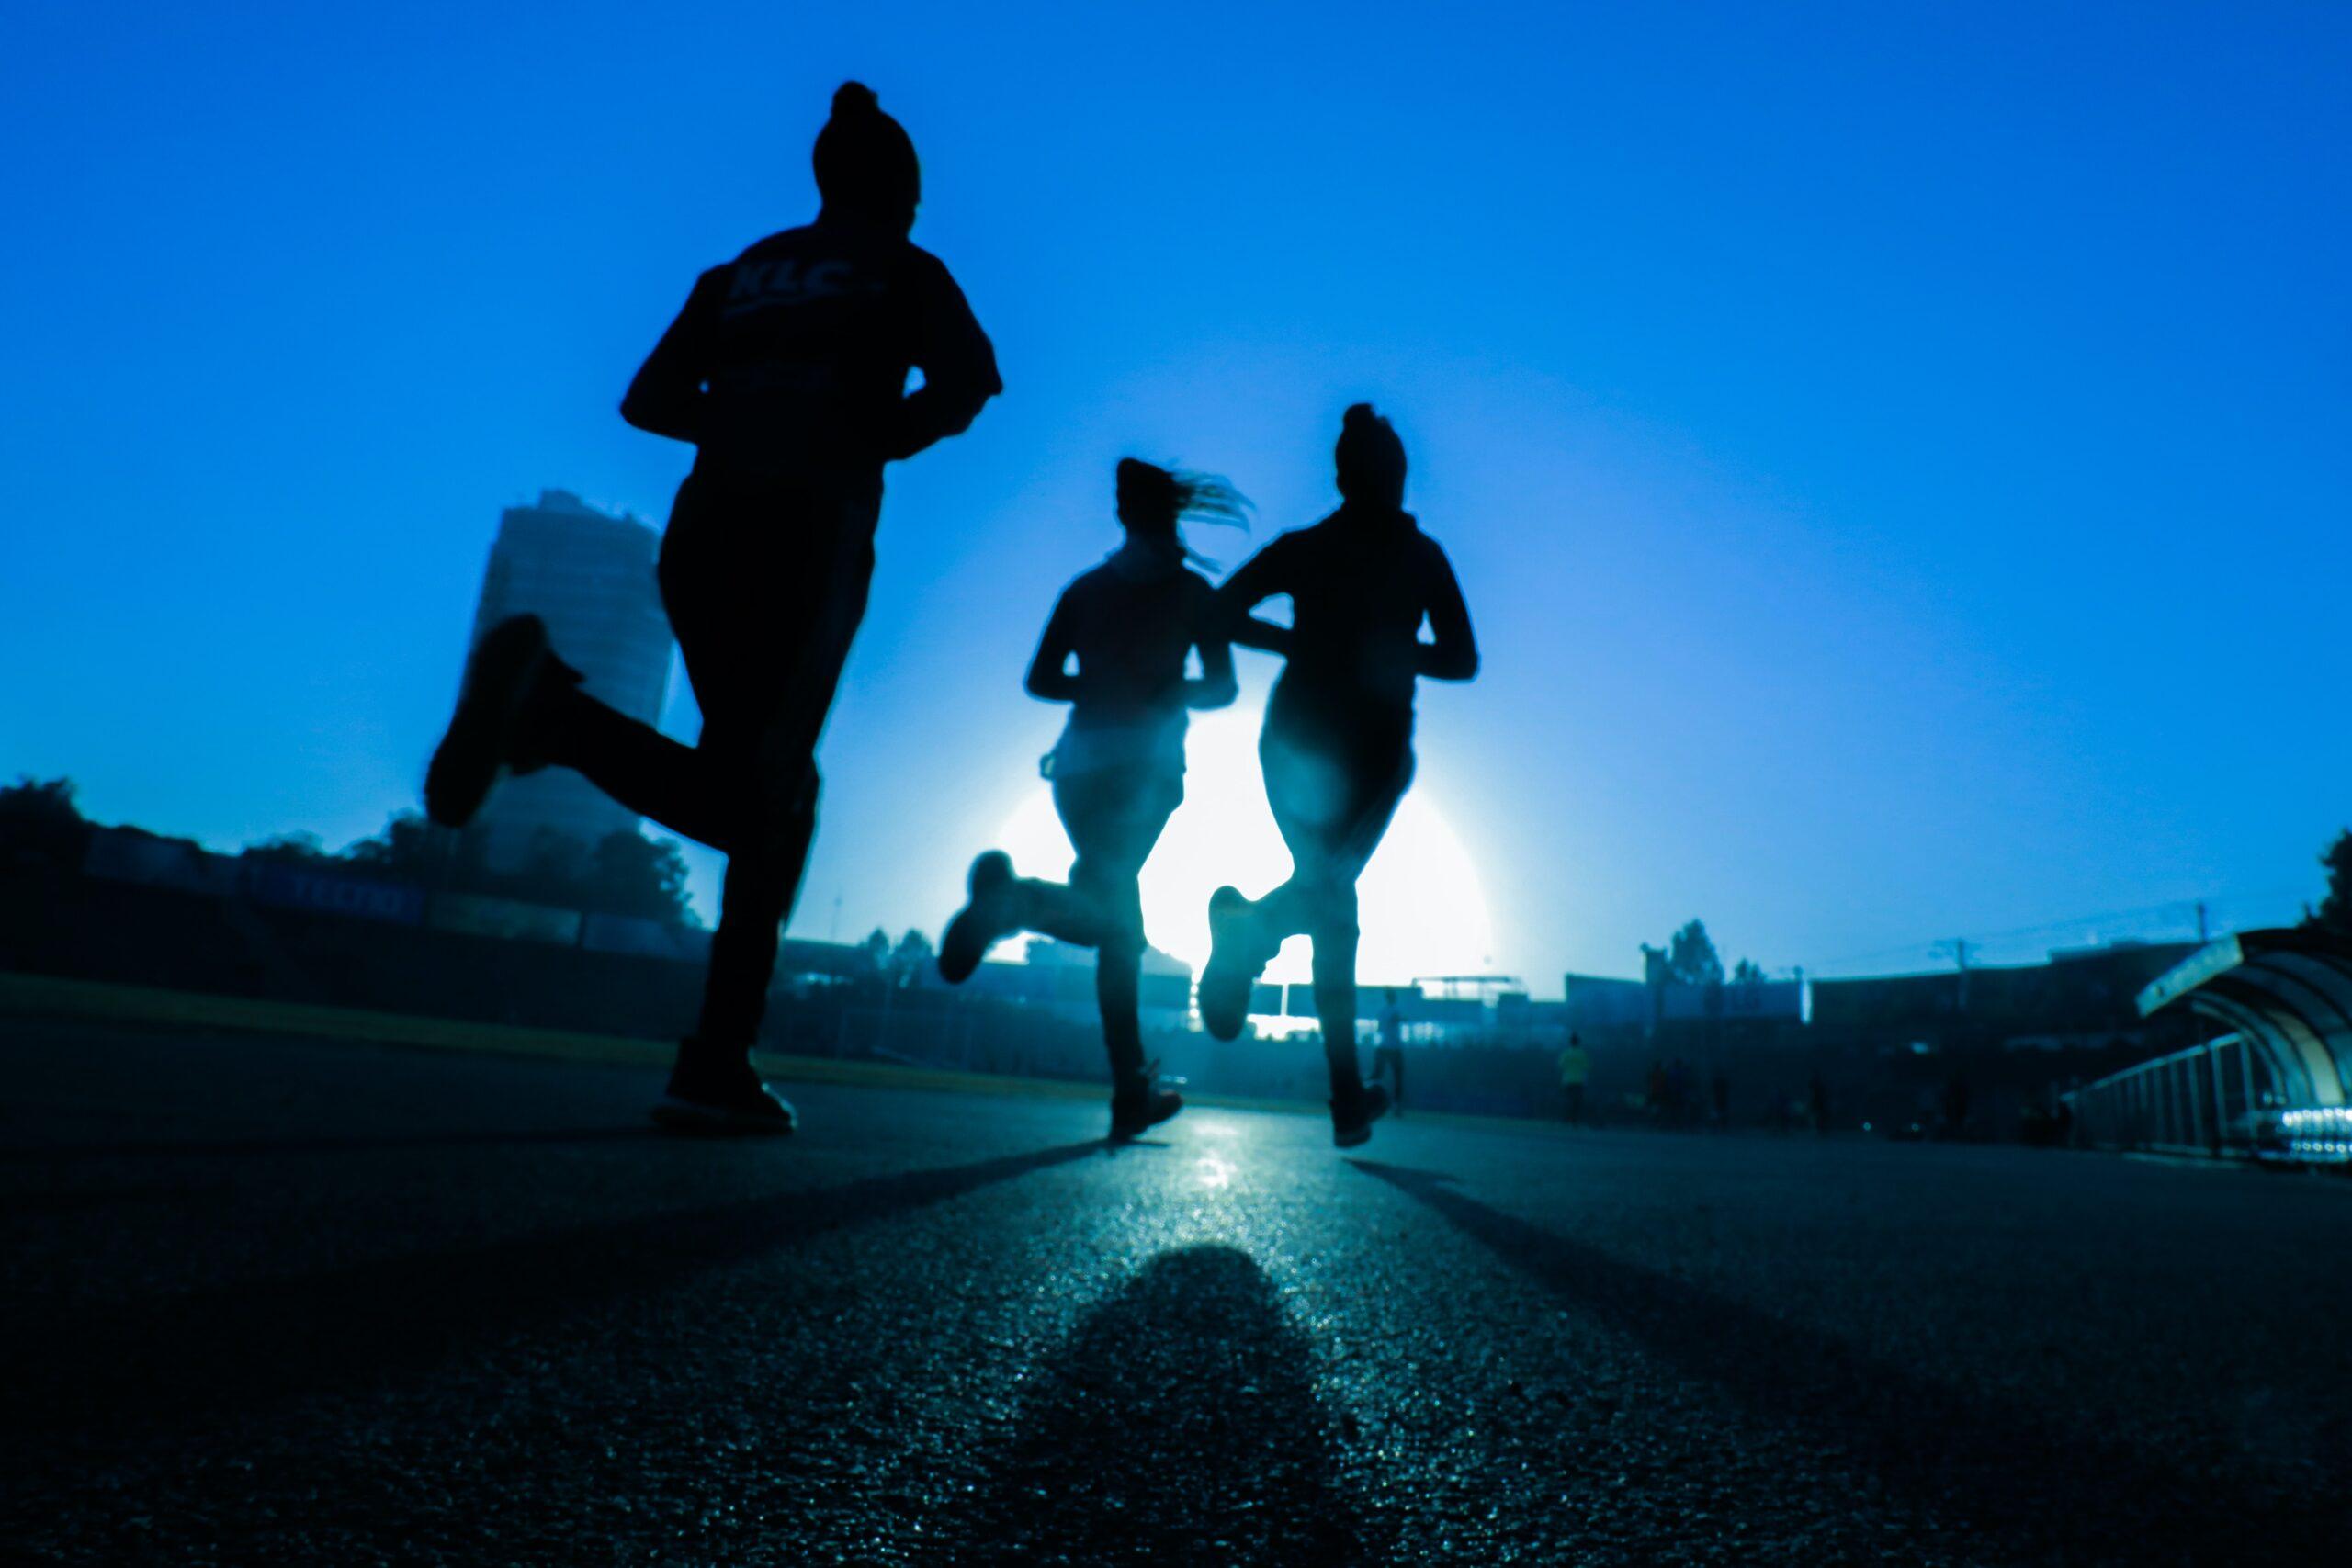 Three joggers running into the sunset